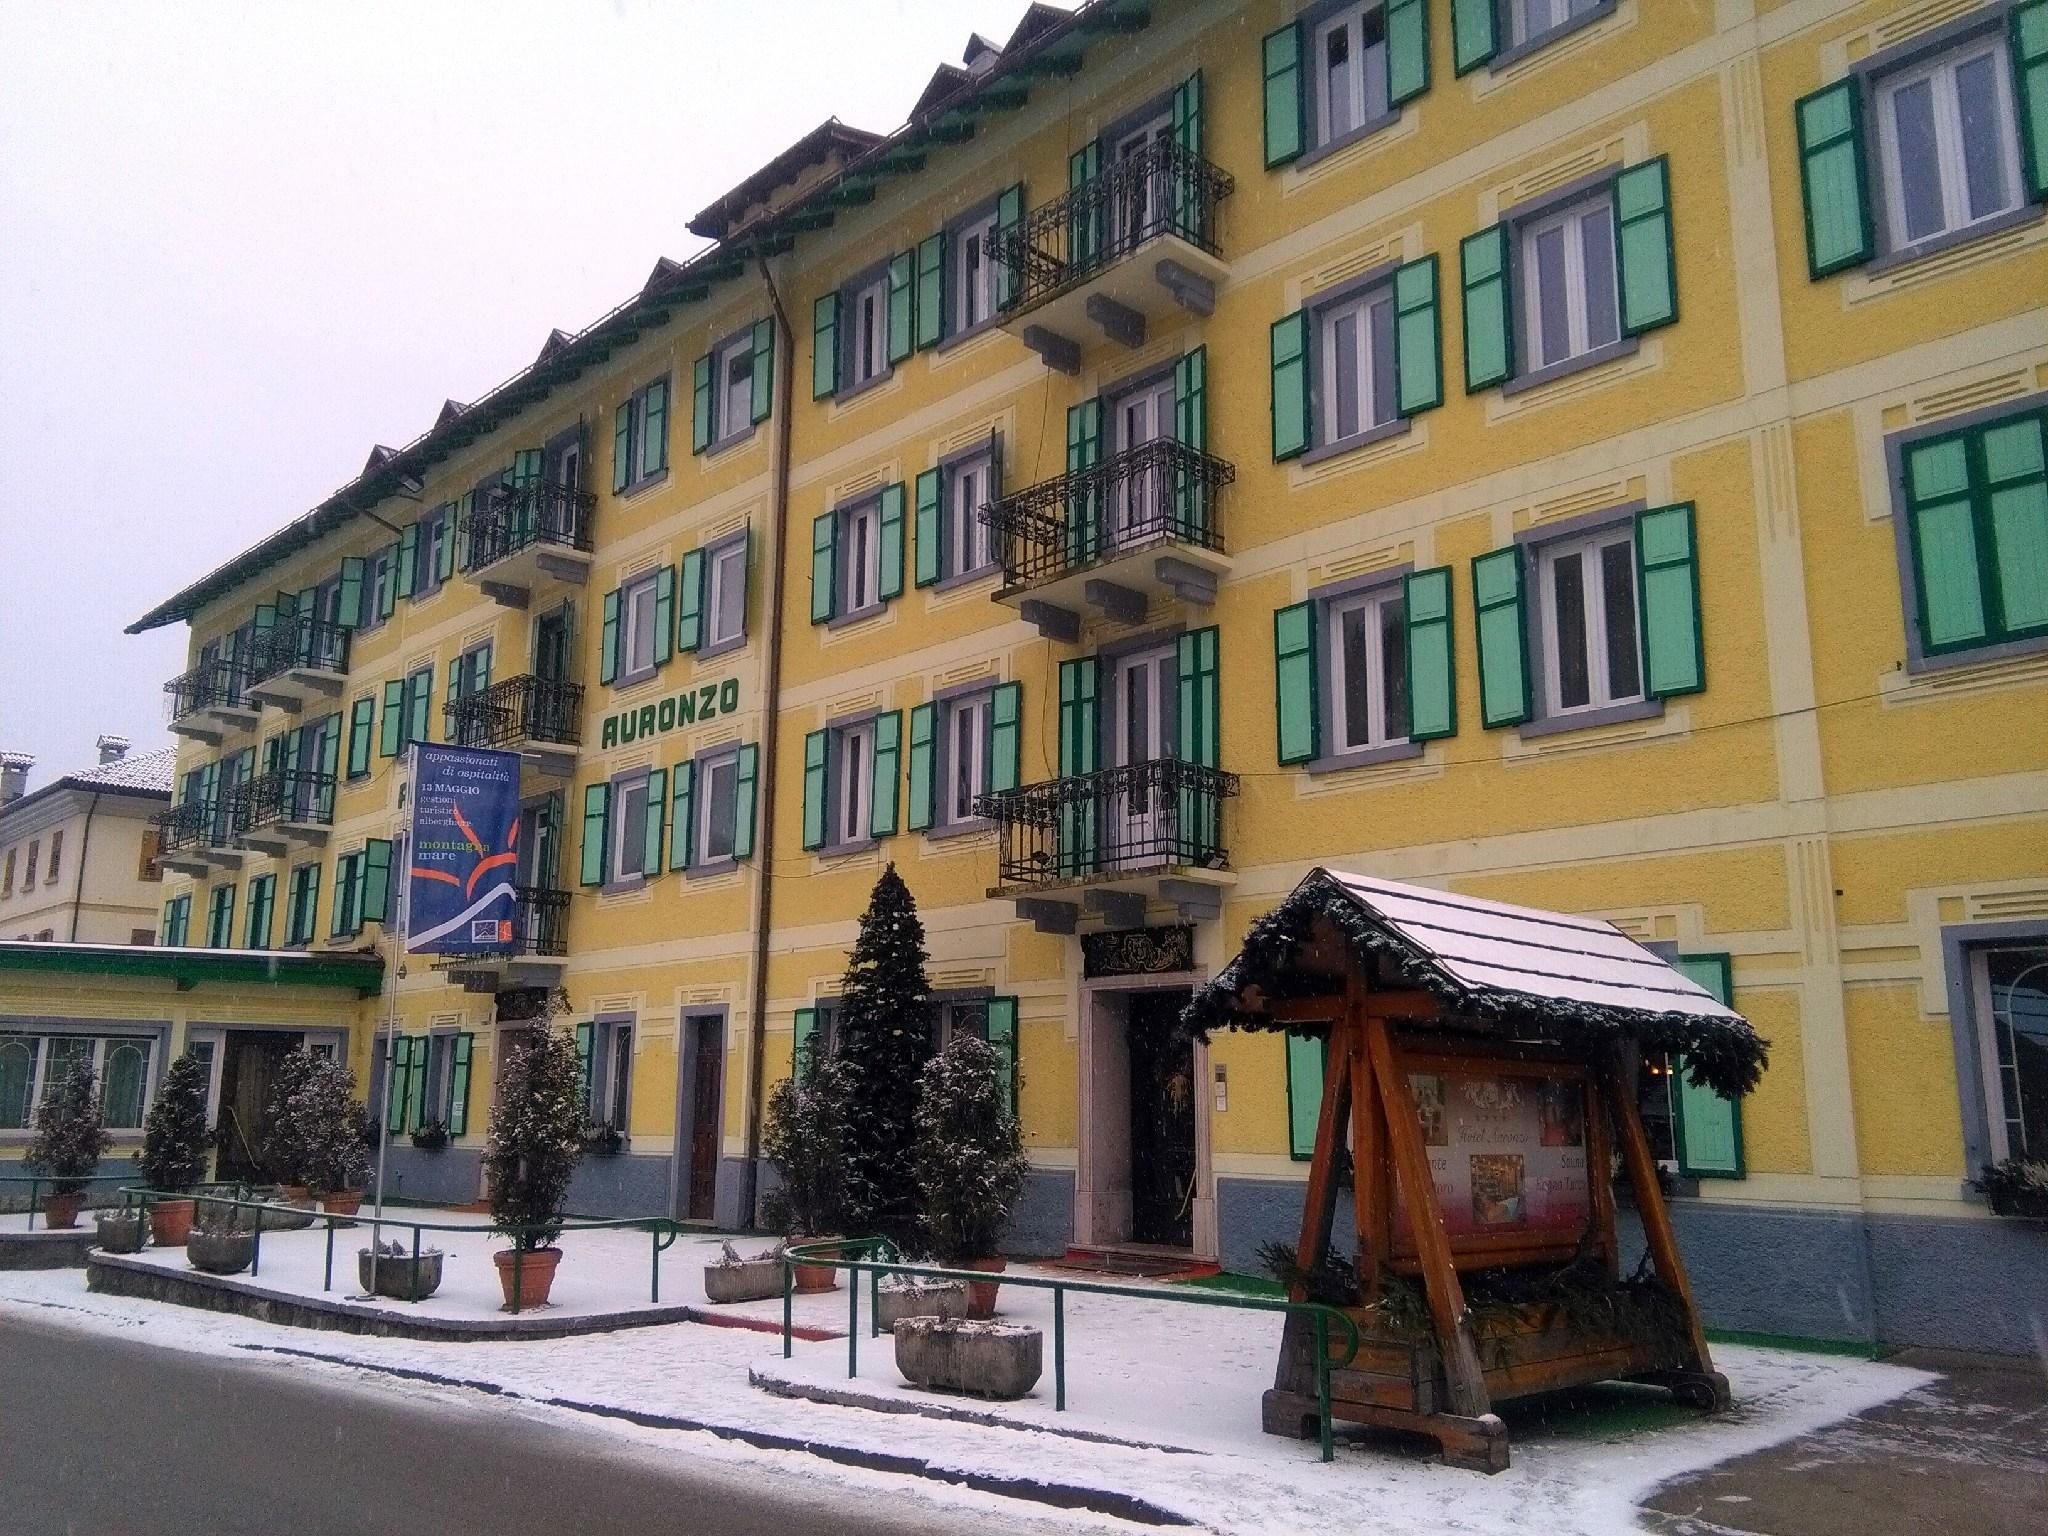 Hotel Auronzo - Struttura